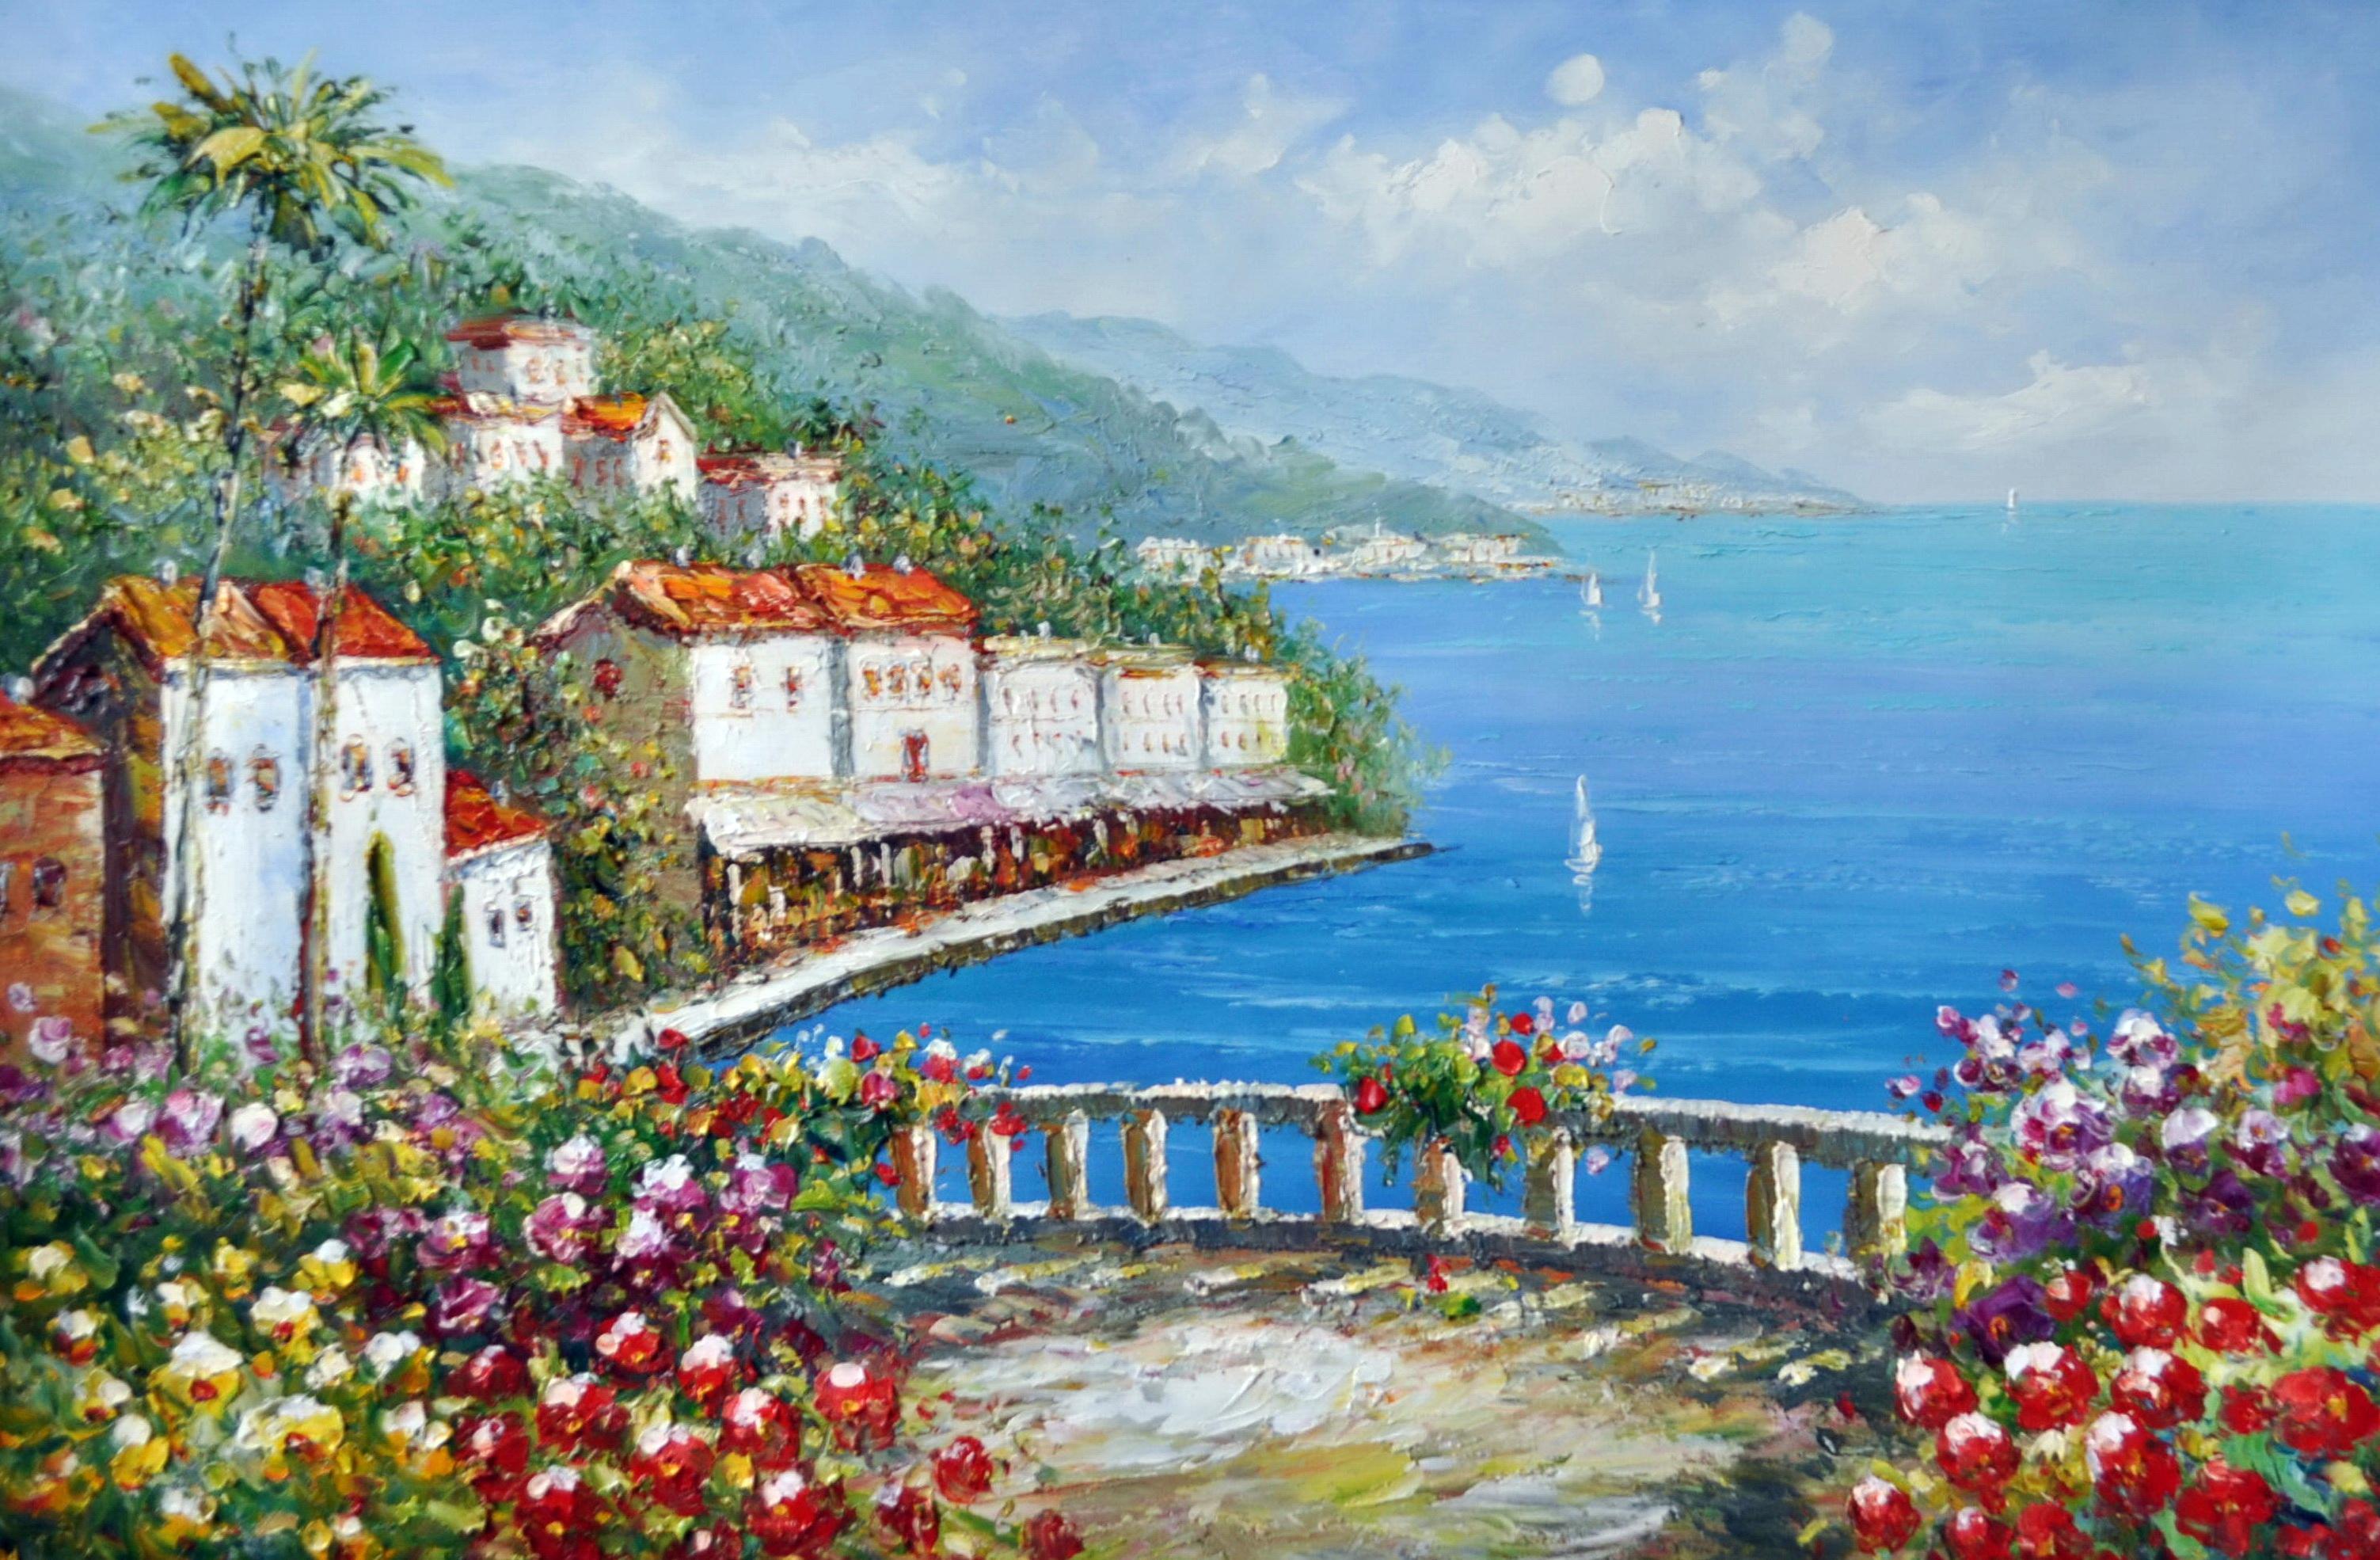 «Средиземноморское воспоминание» картина 60х90 9с018